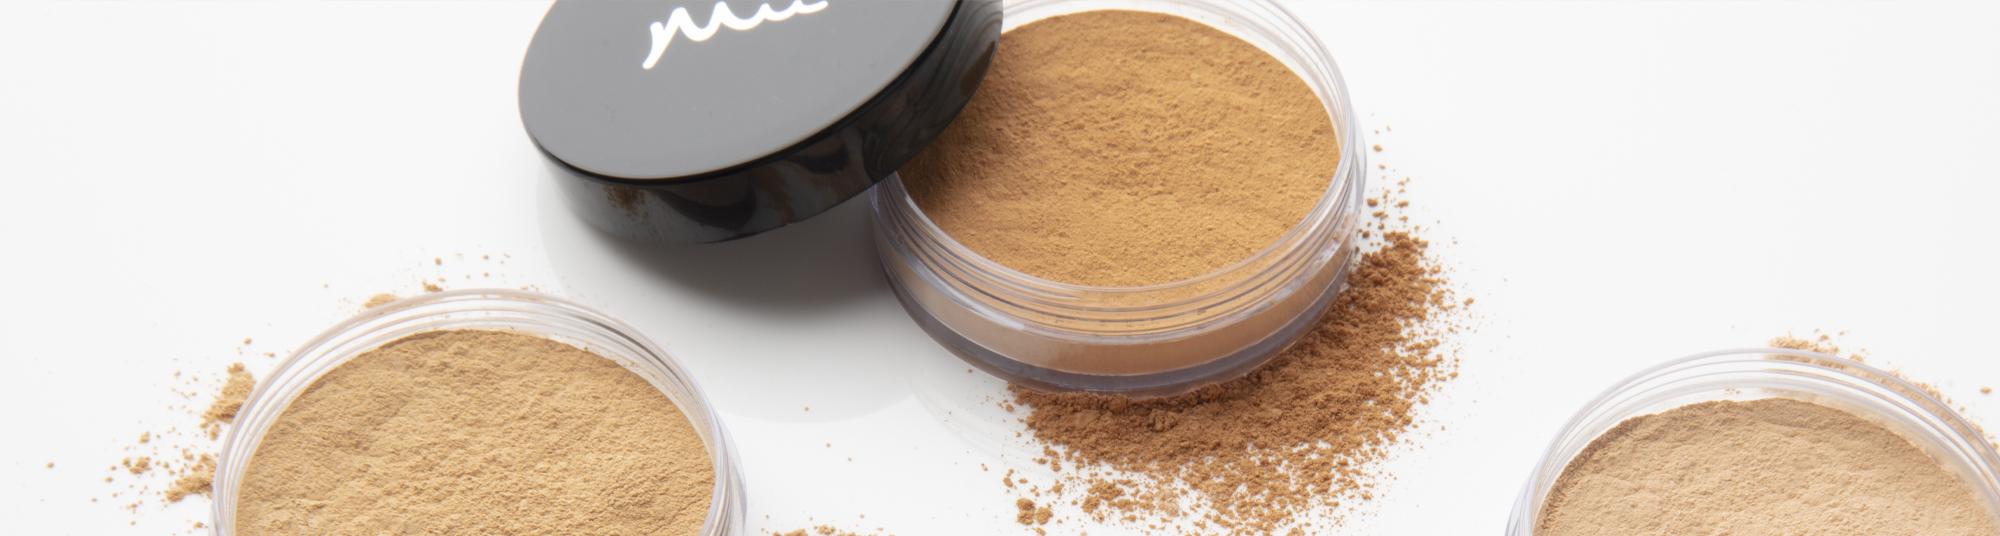 Mii Cosmetics Mineral Foundation